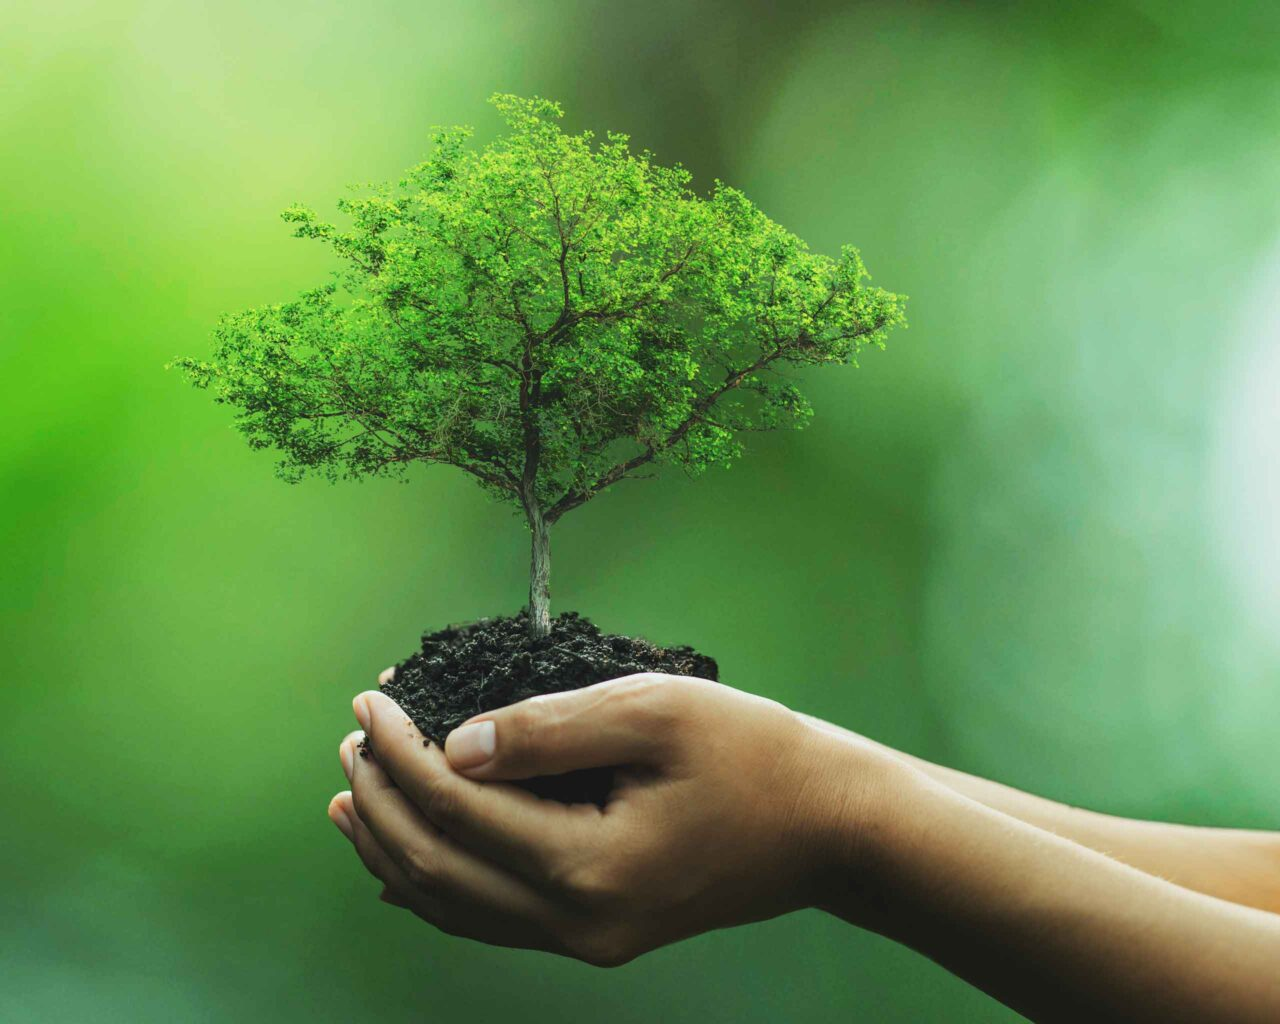 biogas_ecofriendly